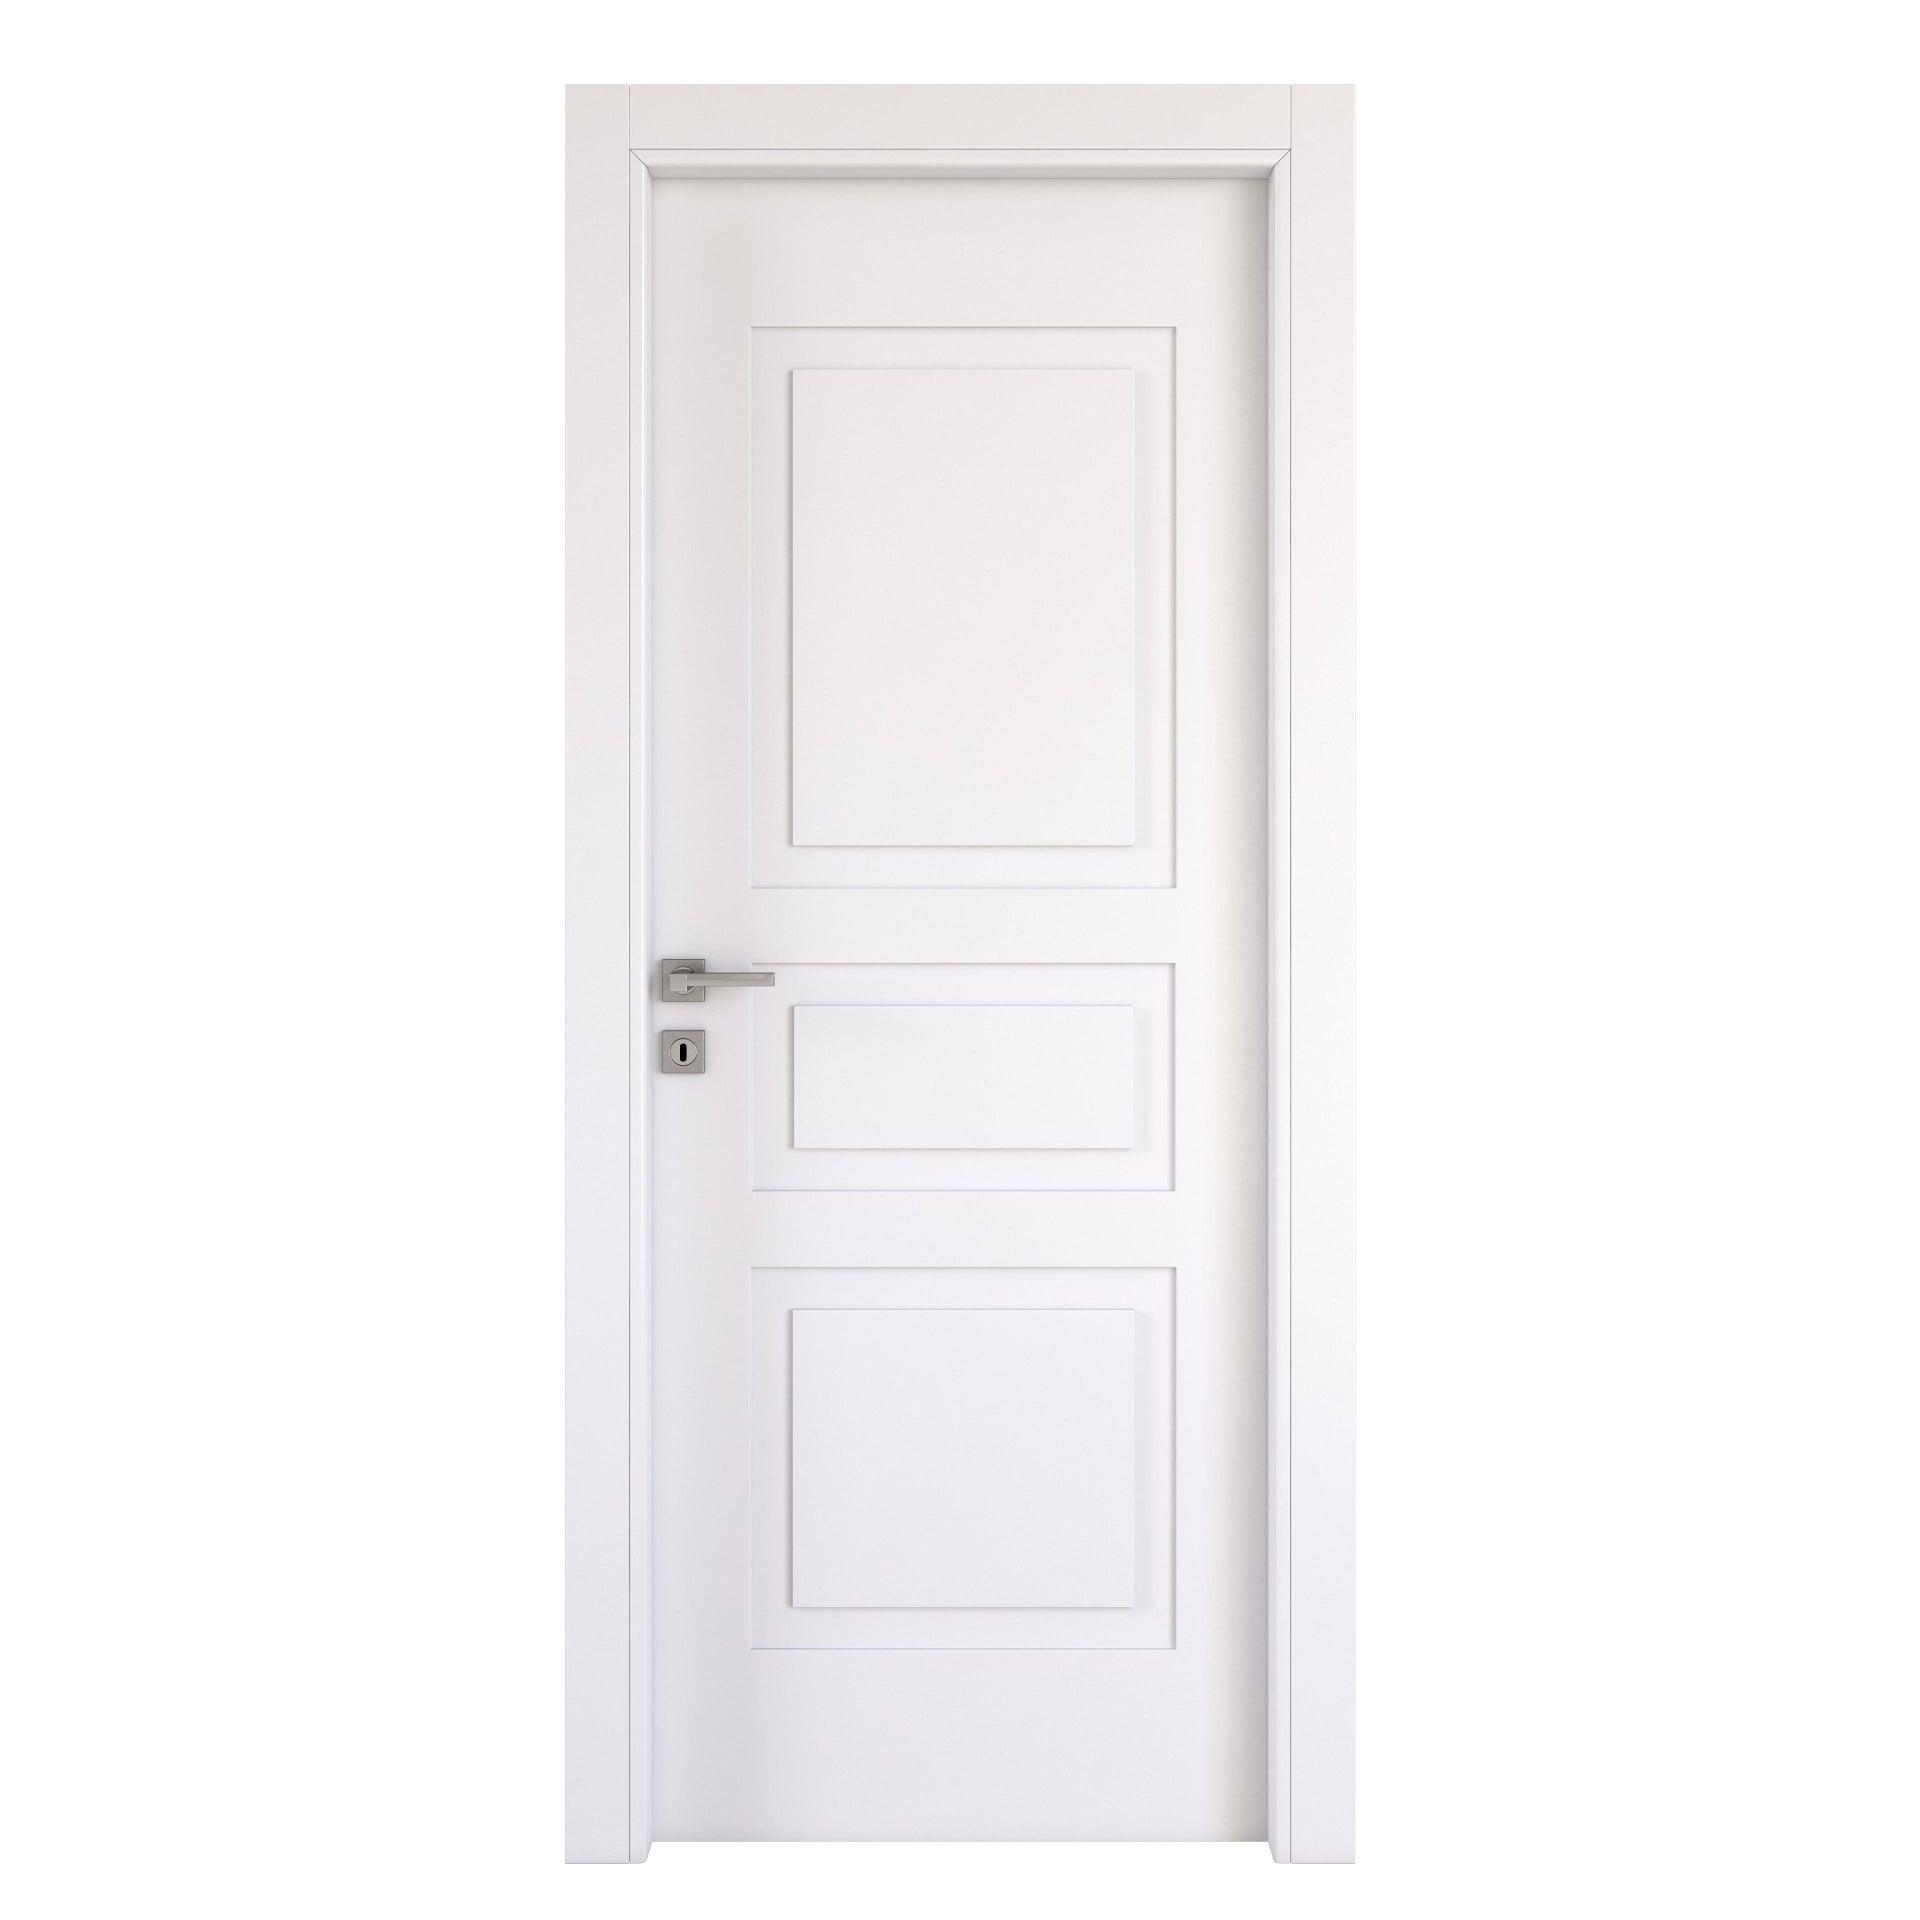 Porta a battente Alioth bianco L 80 x H 210 cm destra - 6